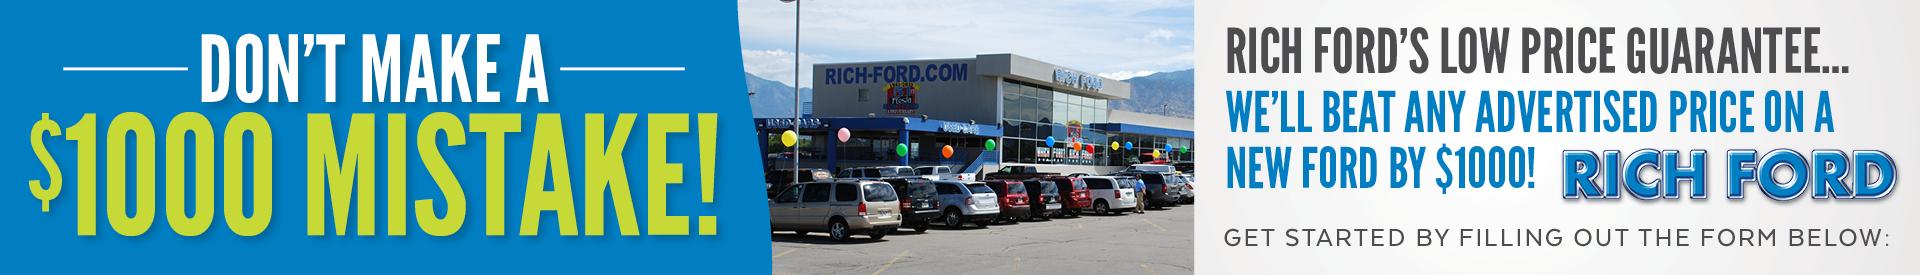 Richford Banner Lowpriceguarantee